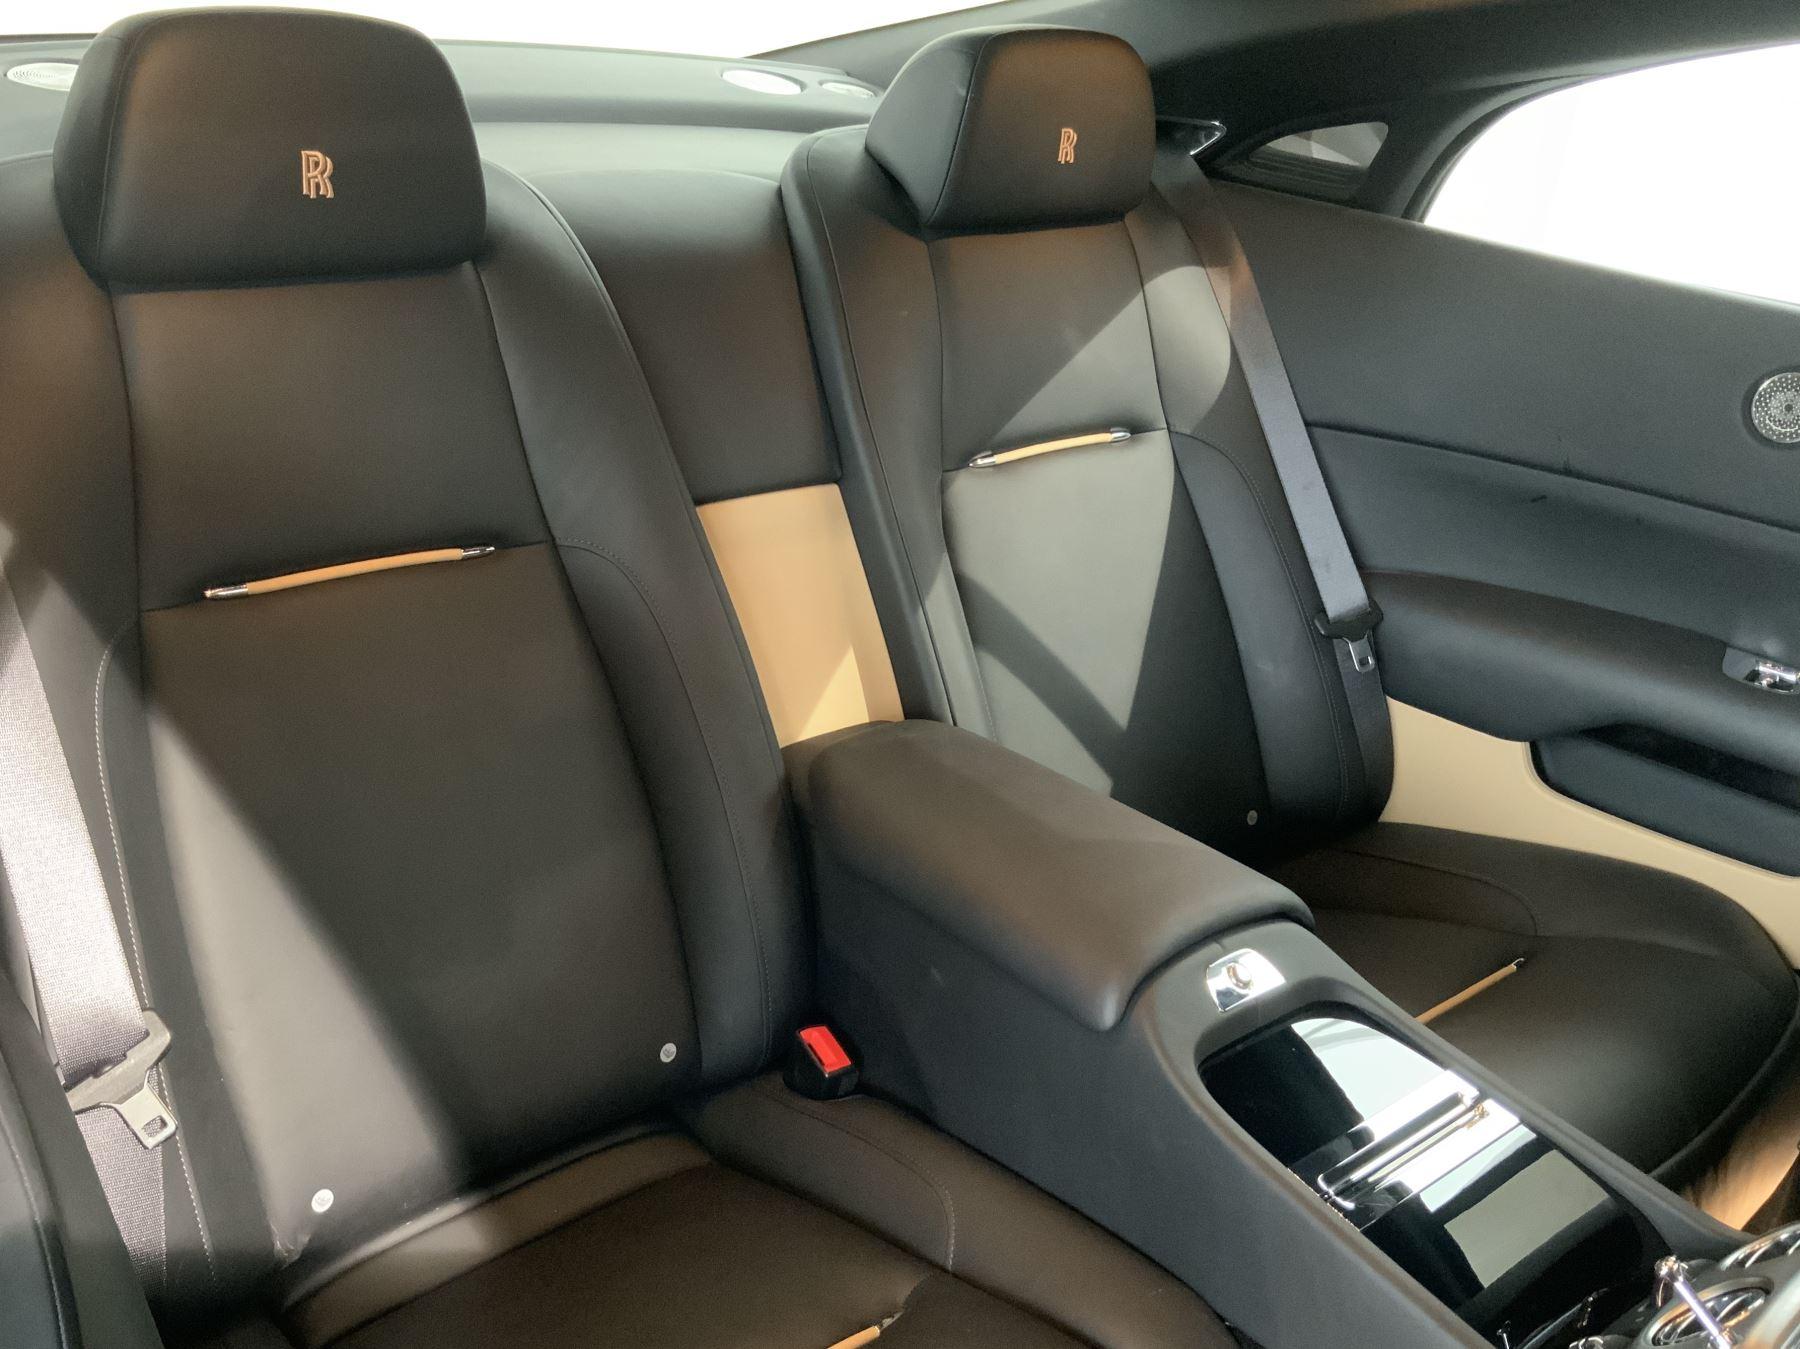 Rolls-Royce Wraith V12 image 16